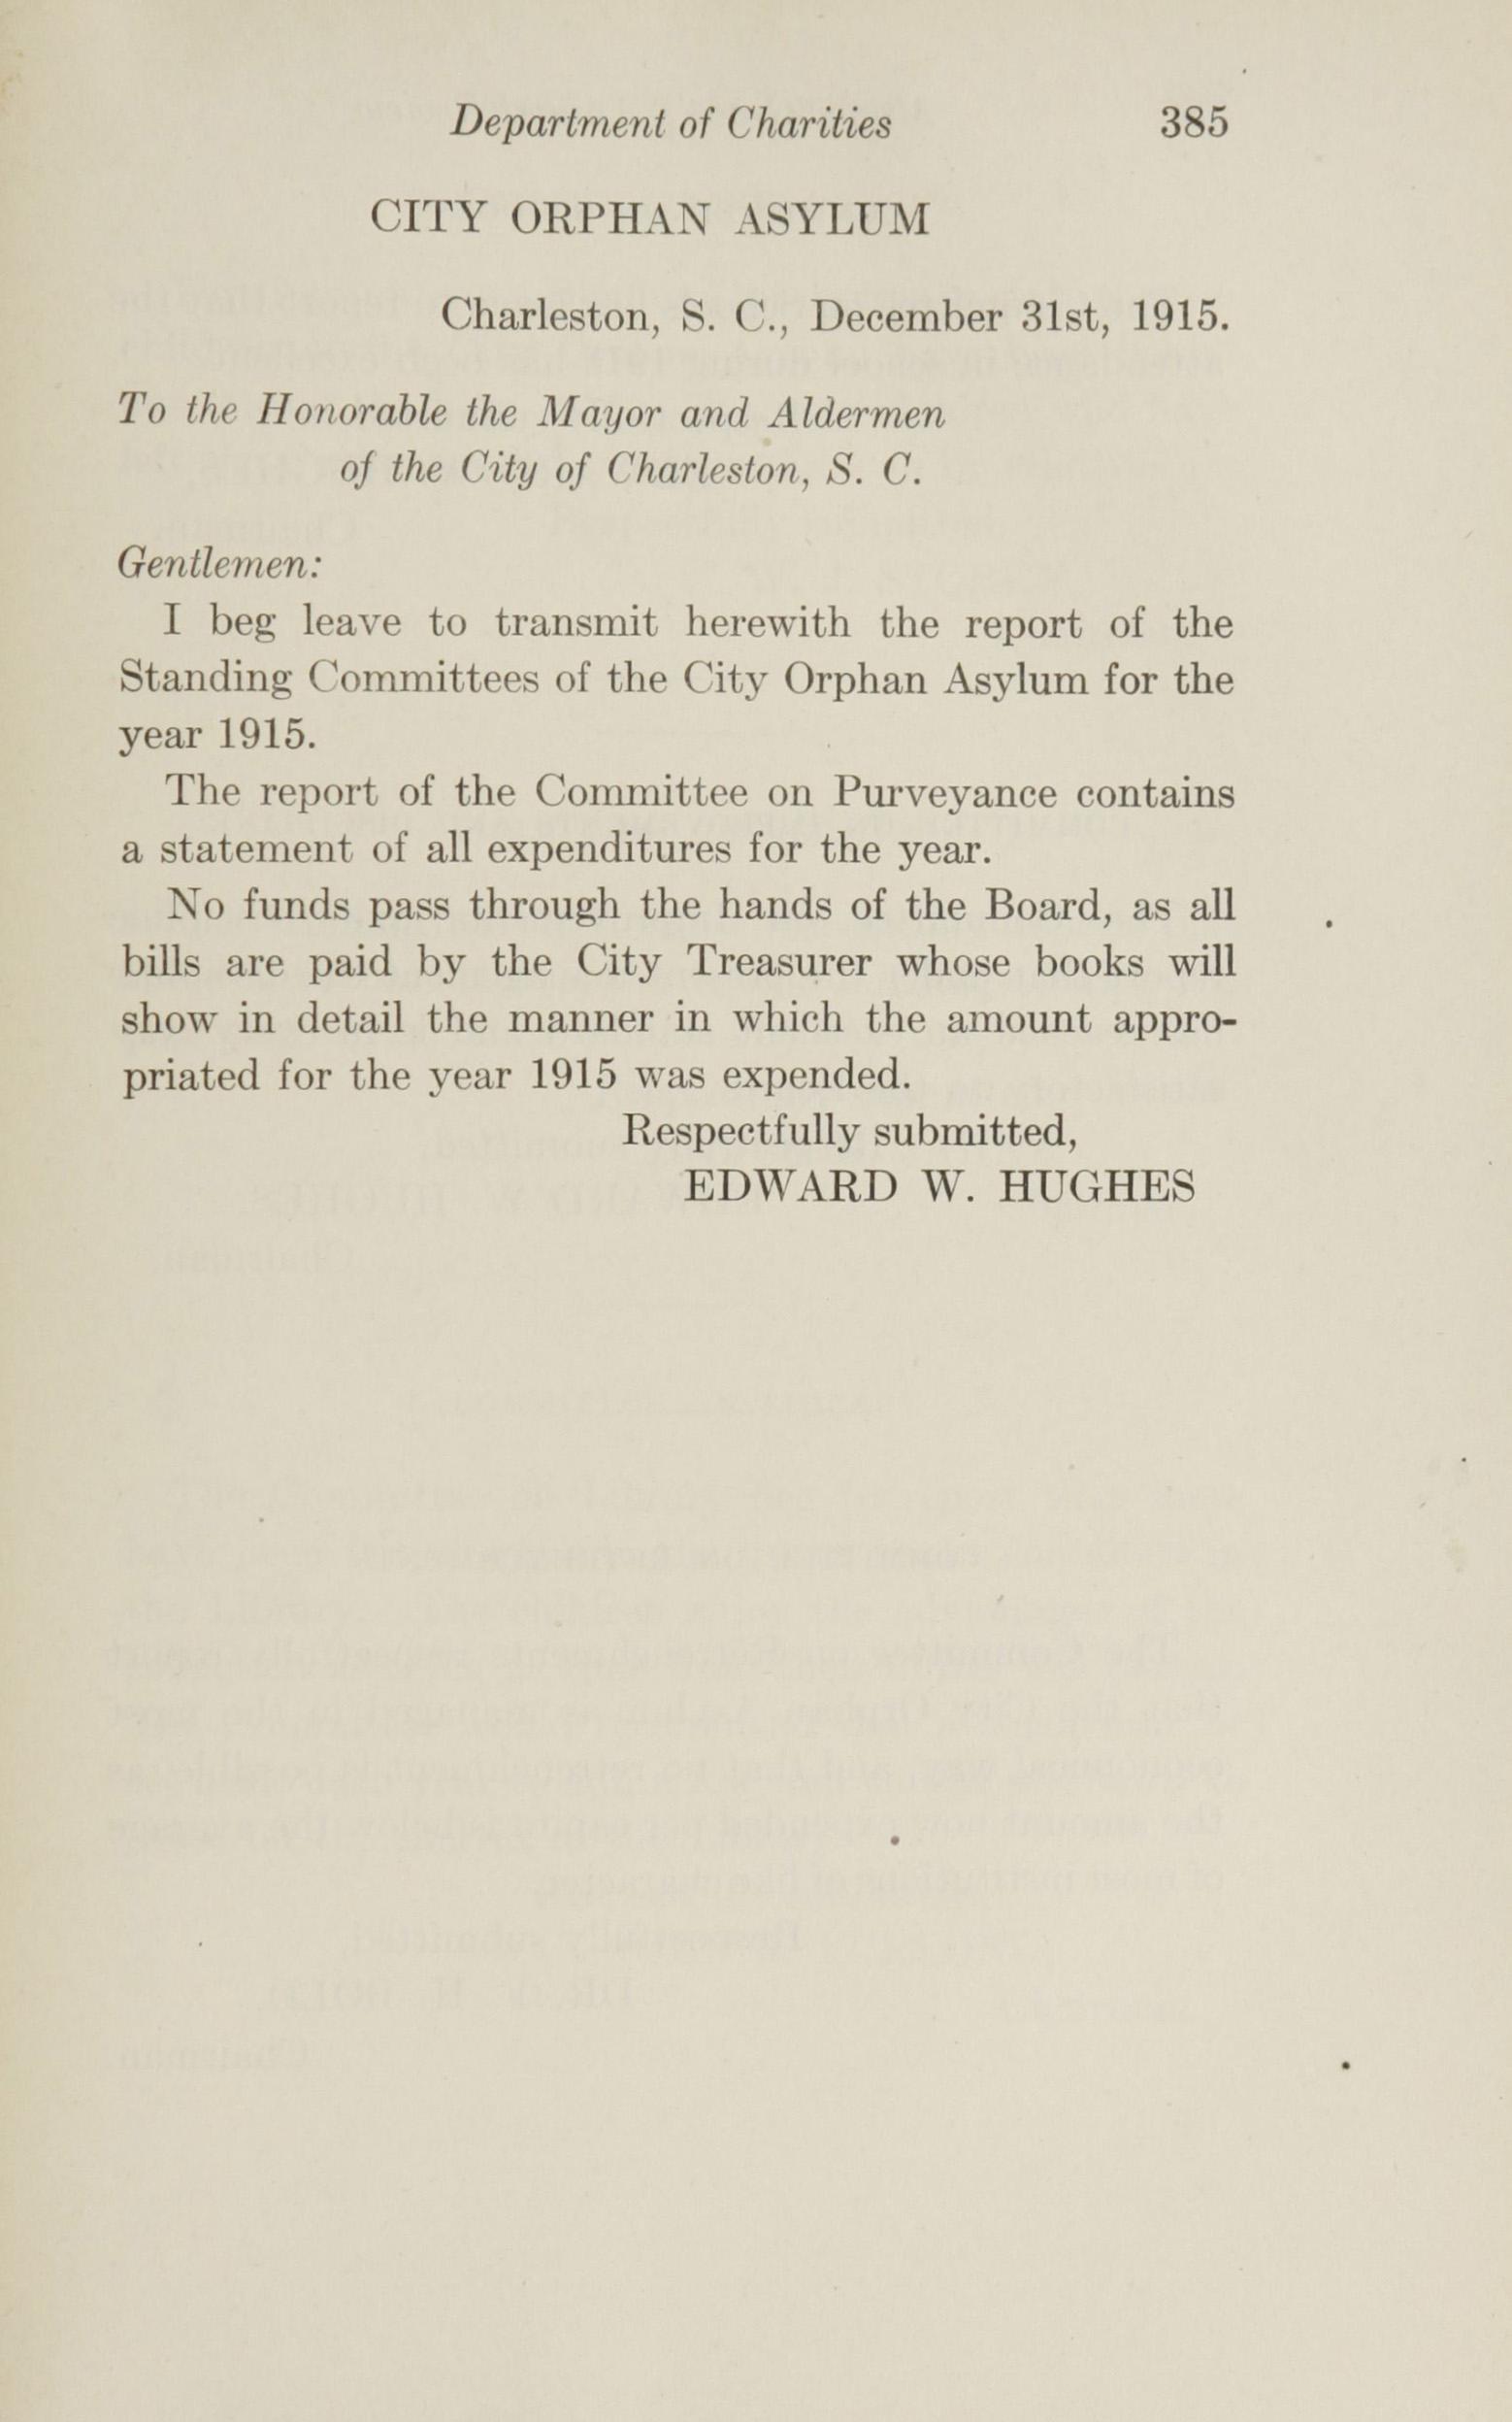 Charleston Yearbook, 1915, page 385